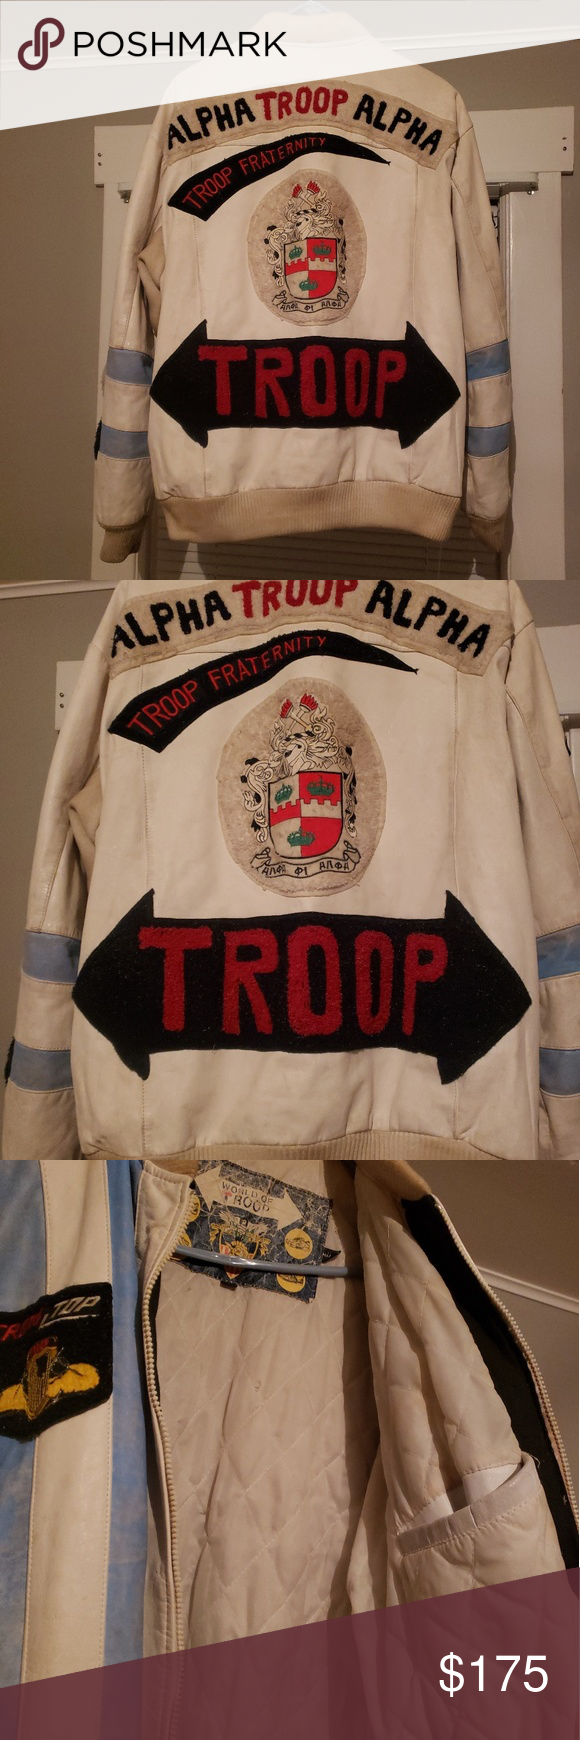 Vintage Alpha Troop Leather Jacket Jackets Leather Jacket Fashion [ 1740 x 580 Pixel ]